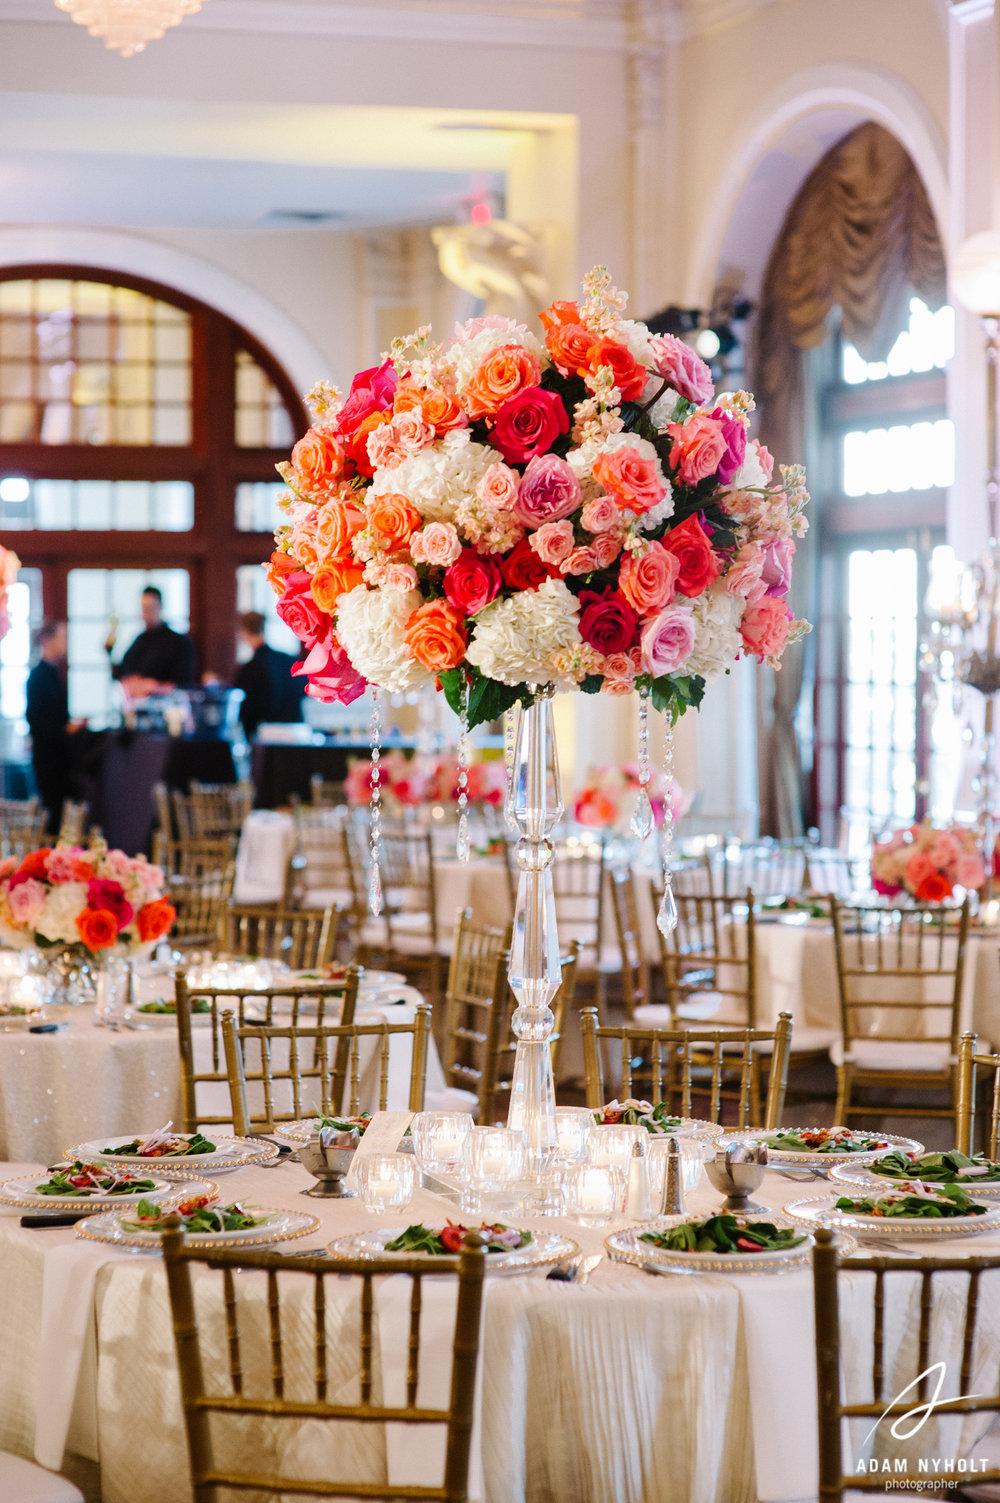 Association of Wedding Planners